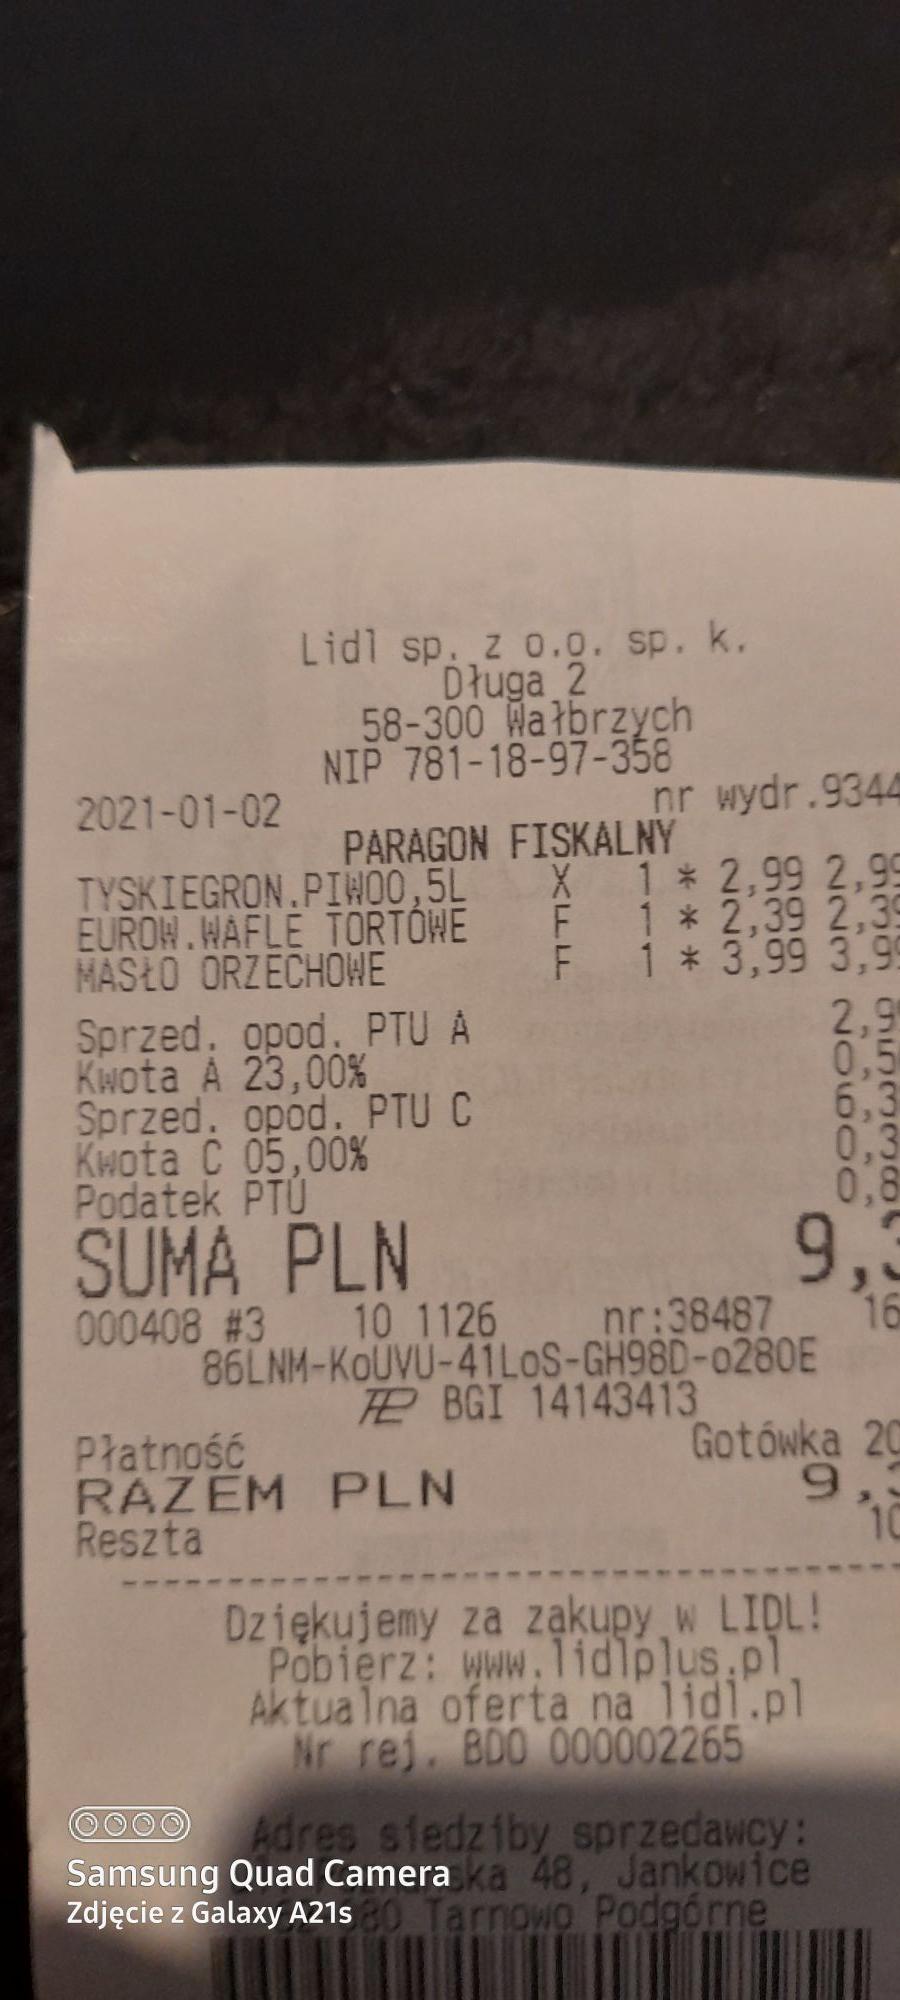 Pasta orzechowa 3.99